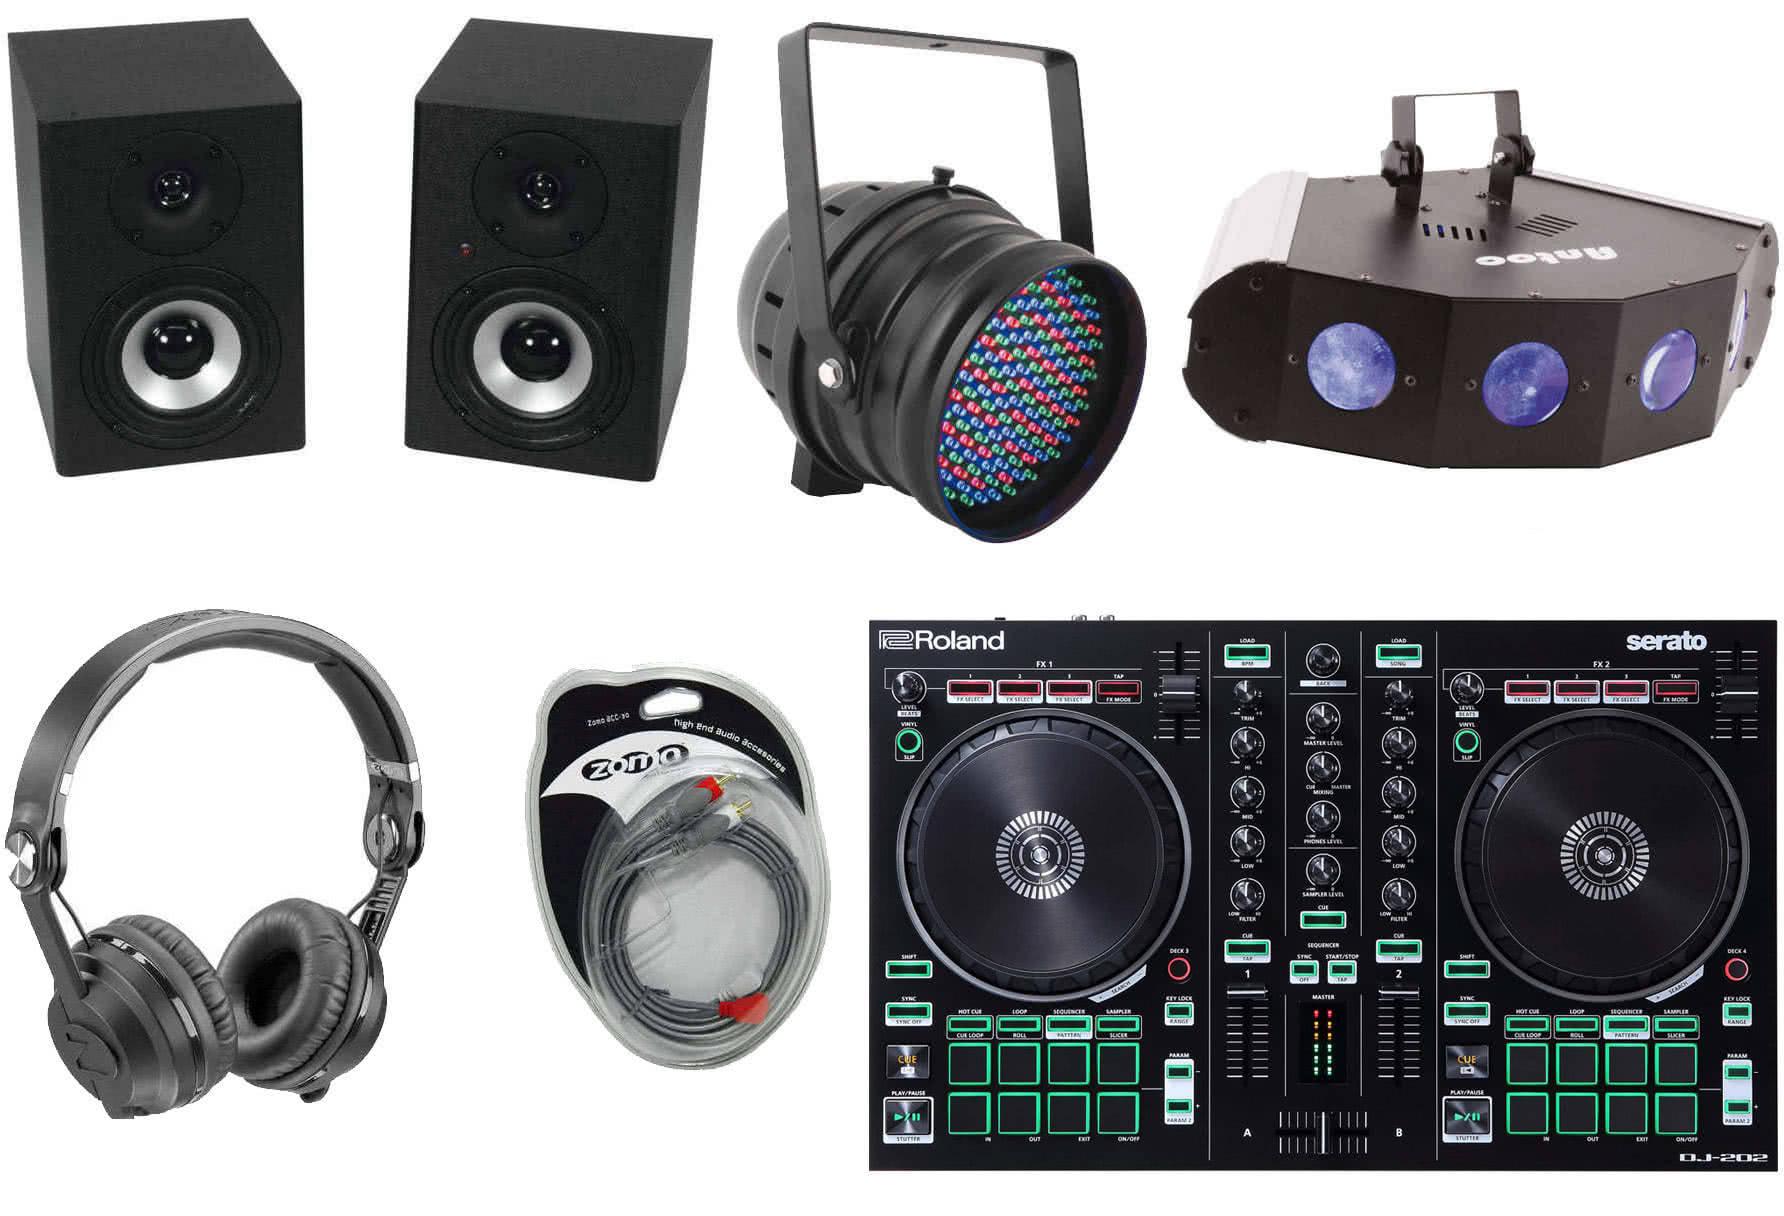 recordcase controller dj starter set plus paquetes de 39 equipos dj material dj. Black Bedroom Furniture Sets. Home Design Ideas